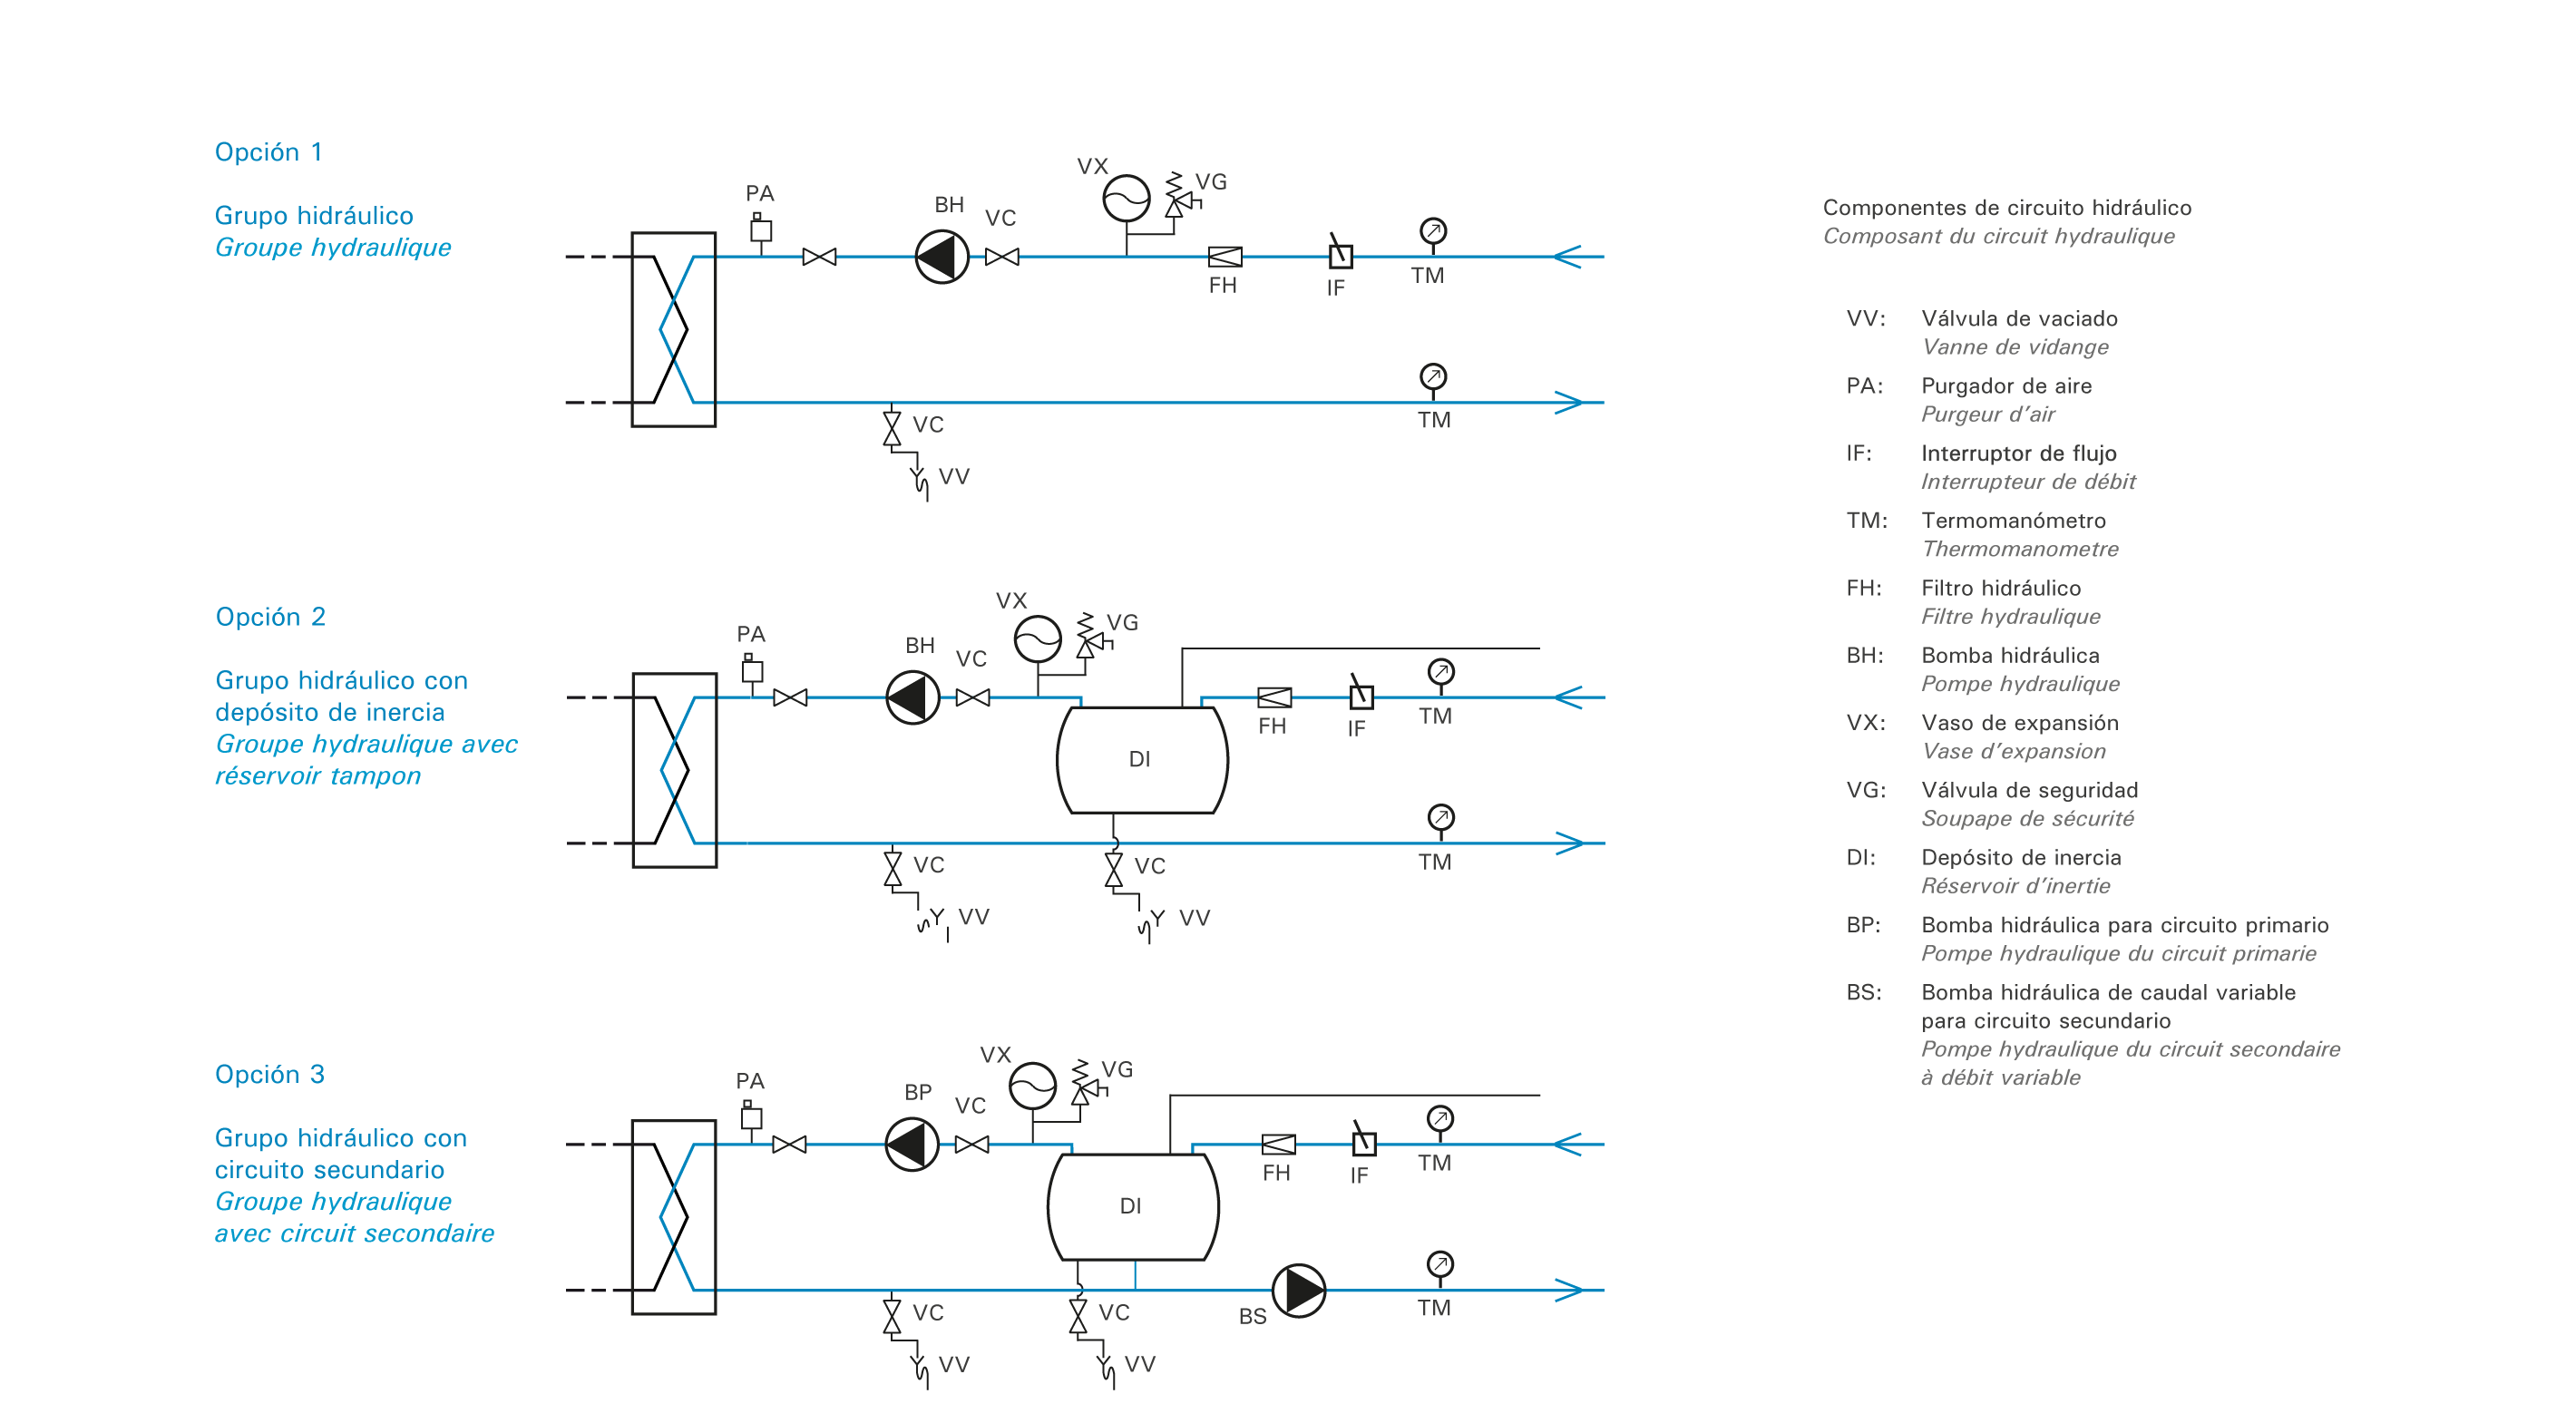 intarpack-chiller-esquema-opción